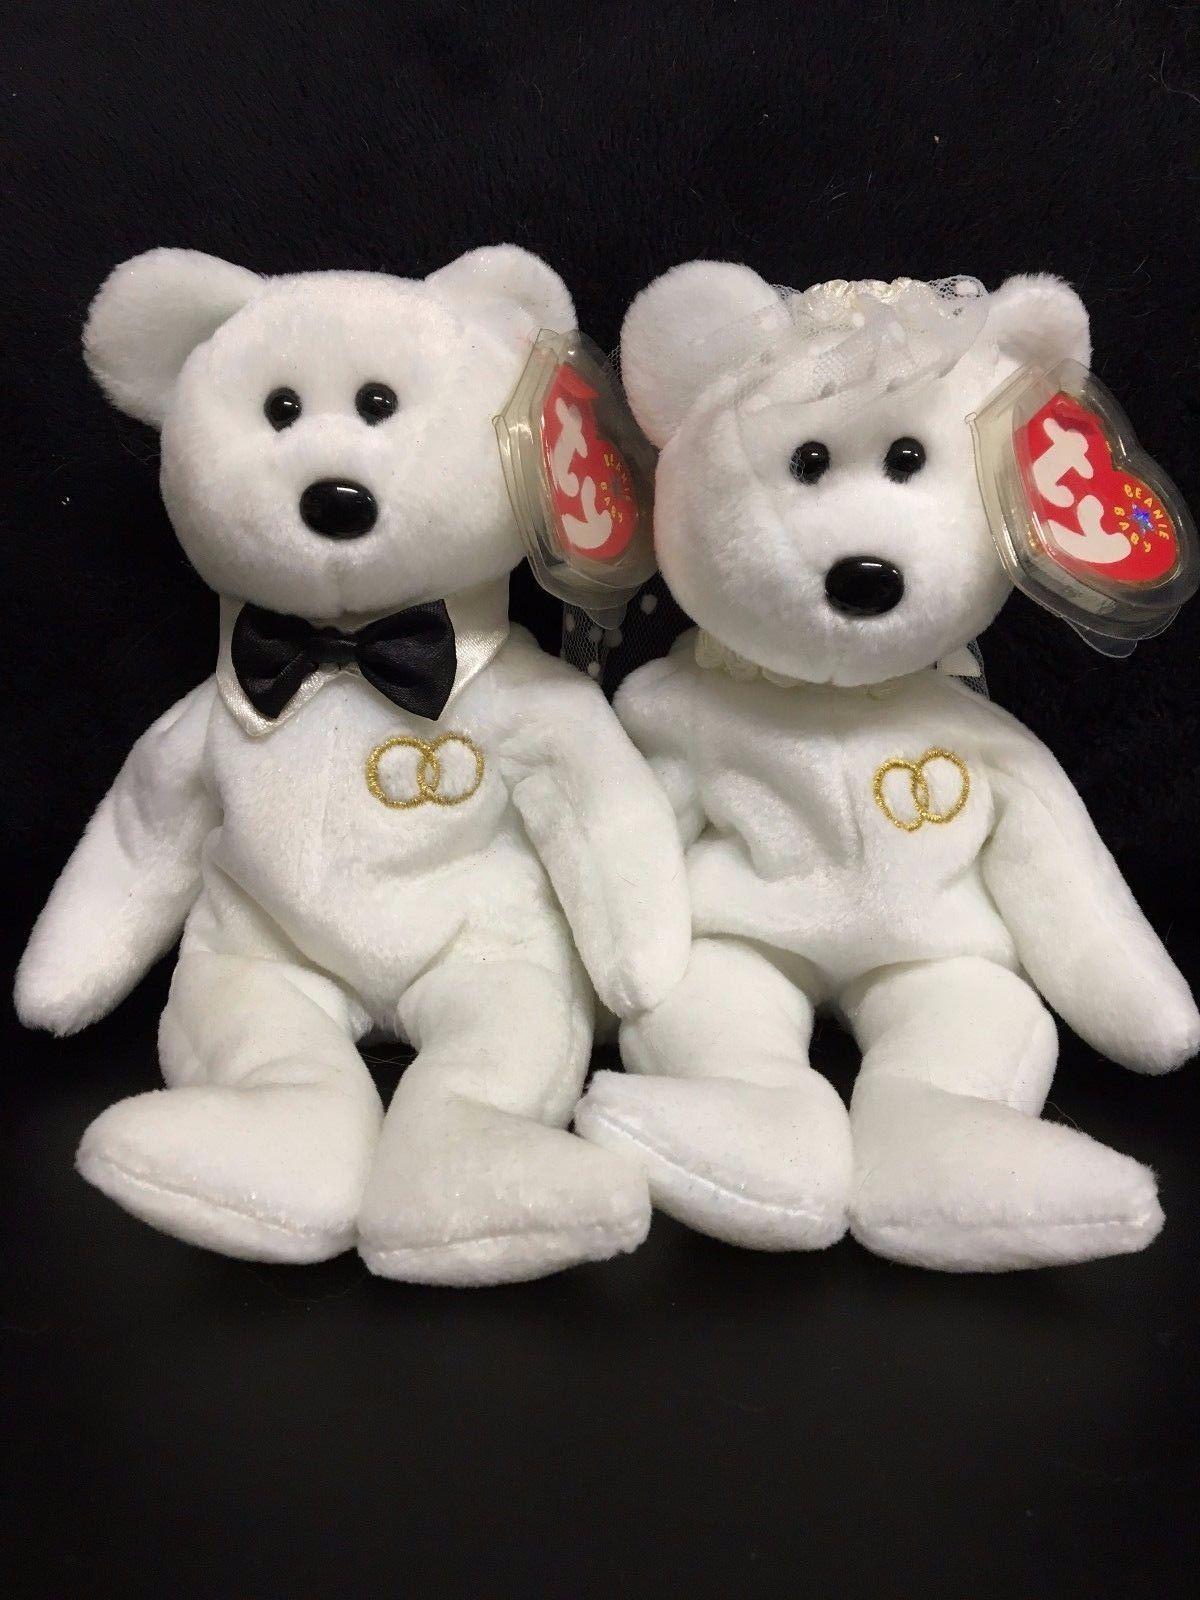 LOT of 2 TY Beanie Babies MR.   MRS. Wedding Bears Retired   Brand NEW  e6e5ec4cdc3